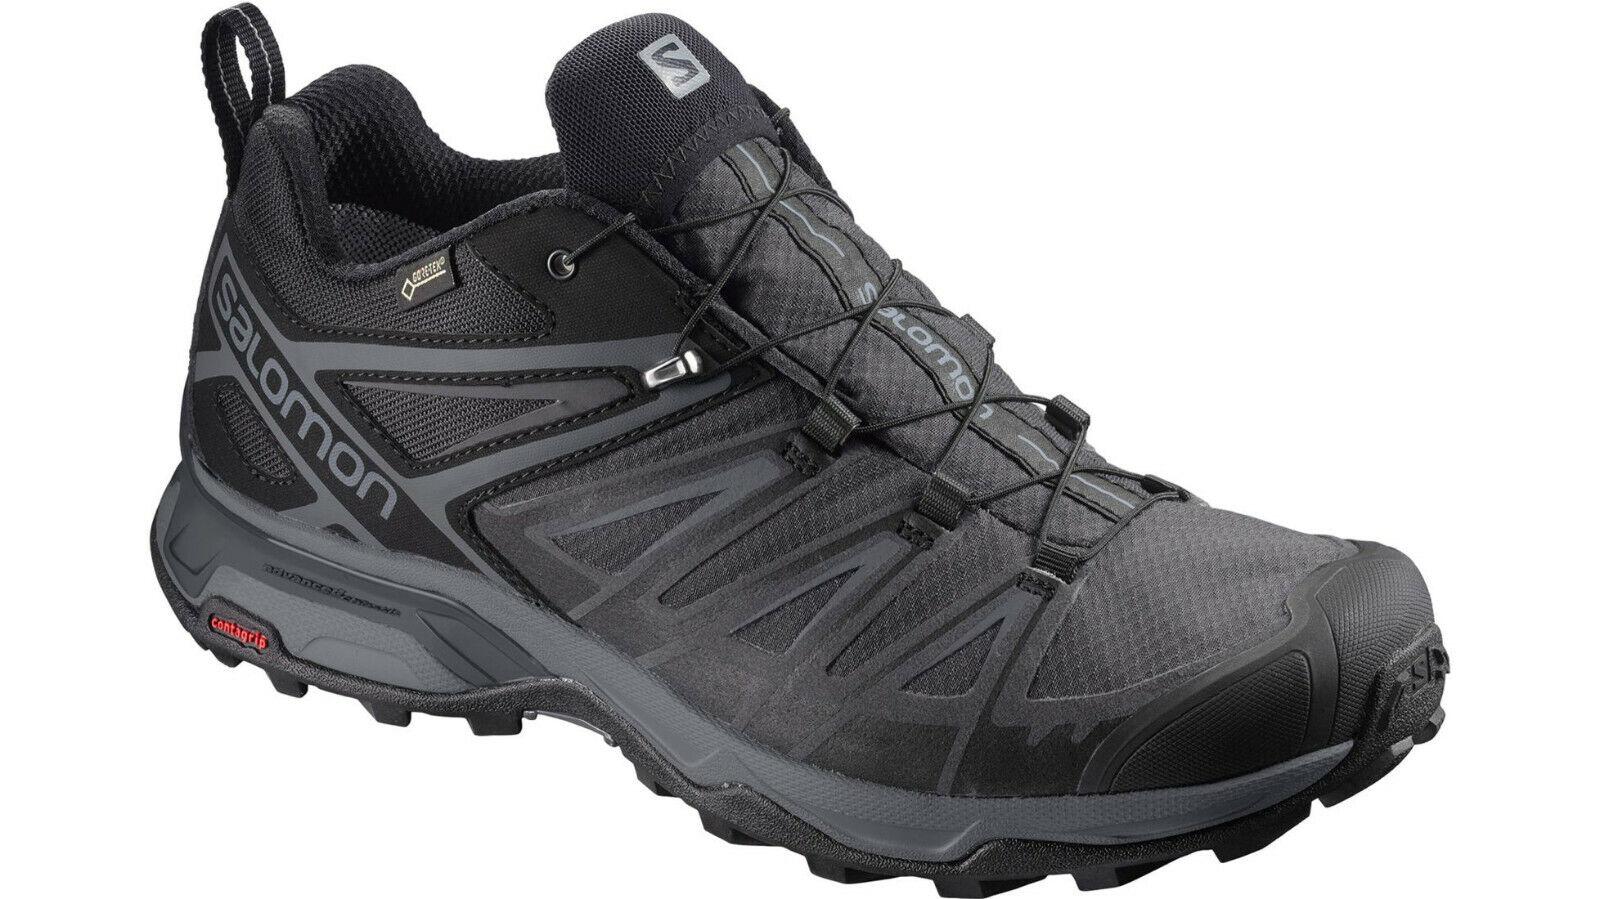 Salomon X Ultra 3 GTX Hiking Shoe Men's BlackMagnet